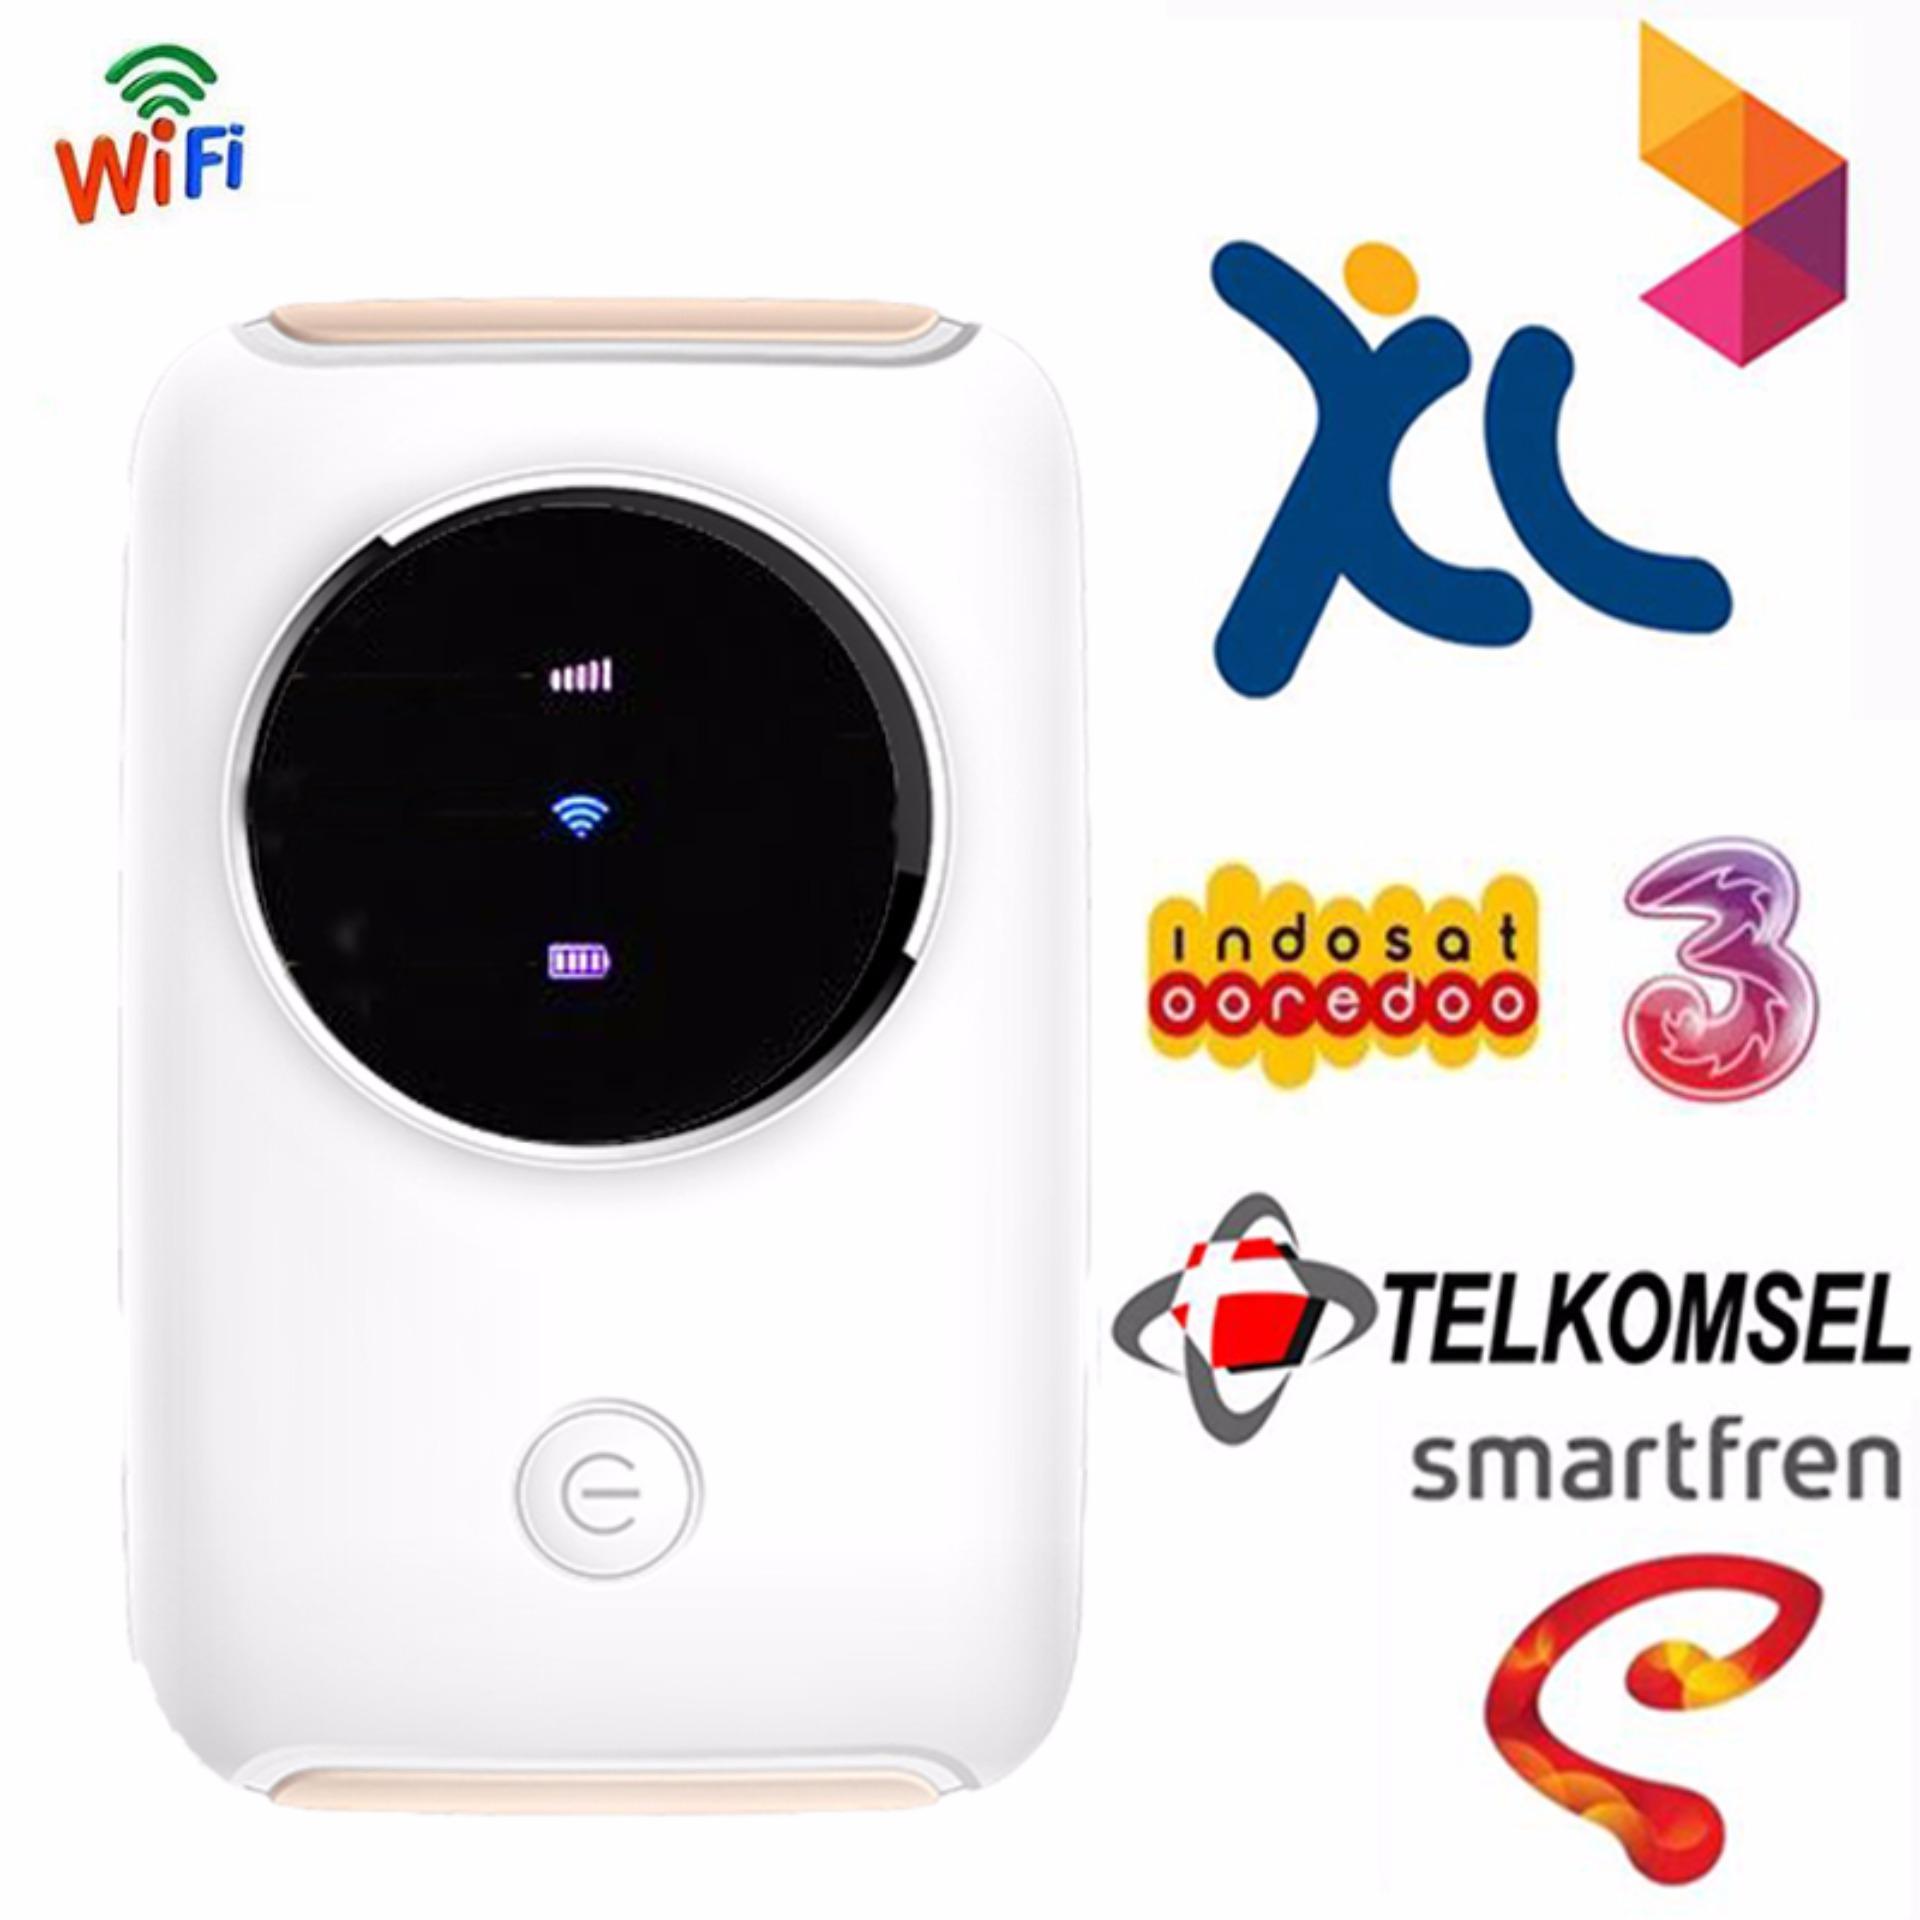 ... 4G Wifi Router 150Mbps Hotspot Car Mifi Modem Broadband Dongle 4GWi-Fi Router - intl ...